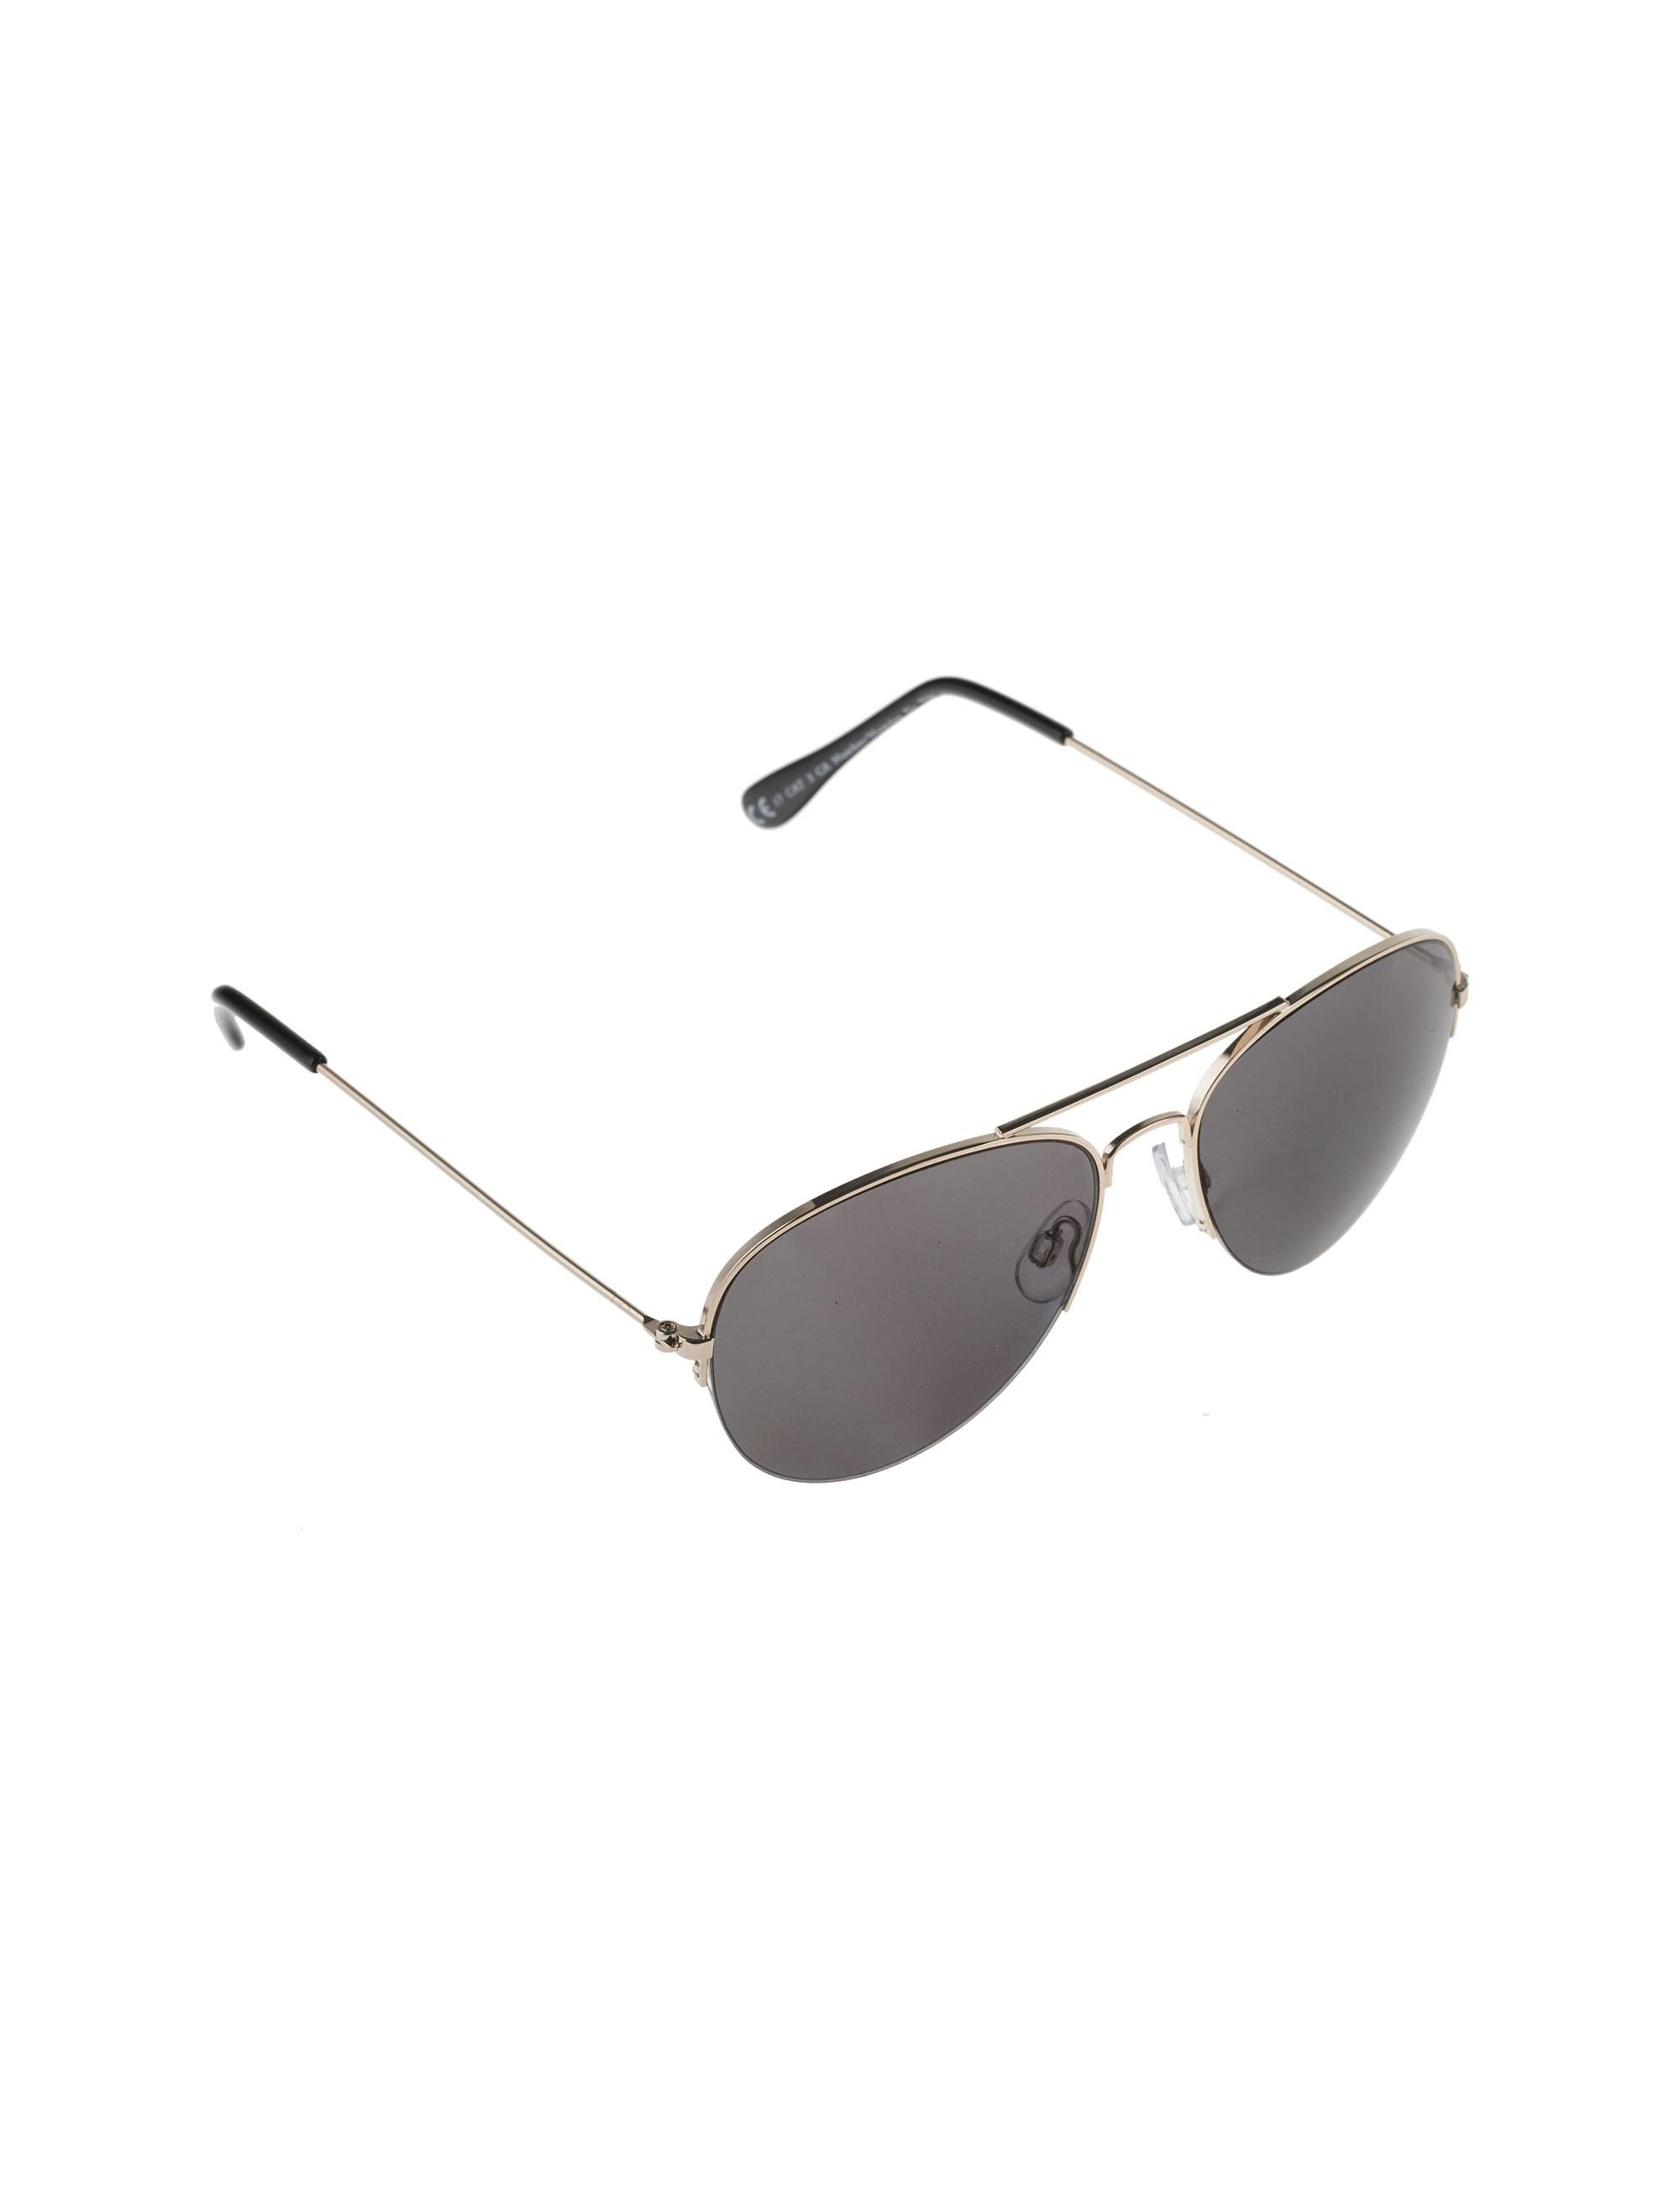 عینک آفتابی خلبانی زنانه - پی سز